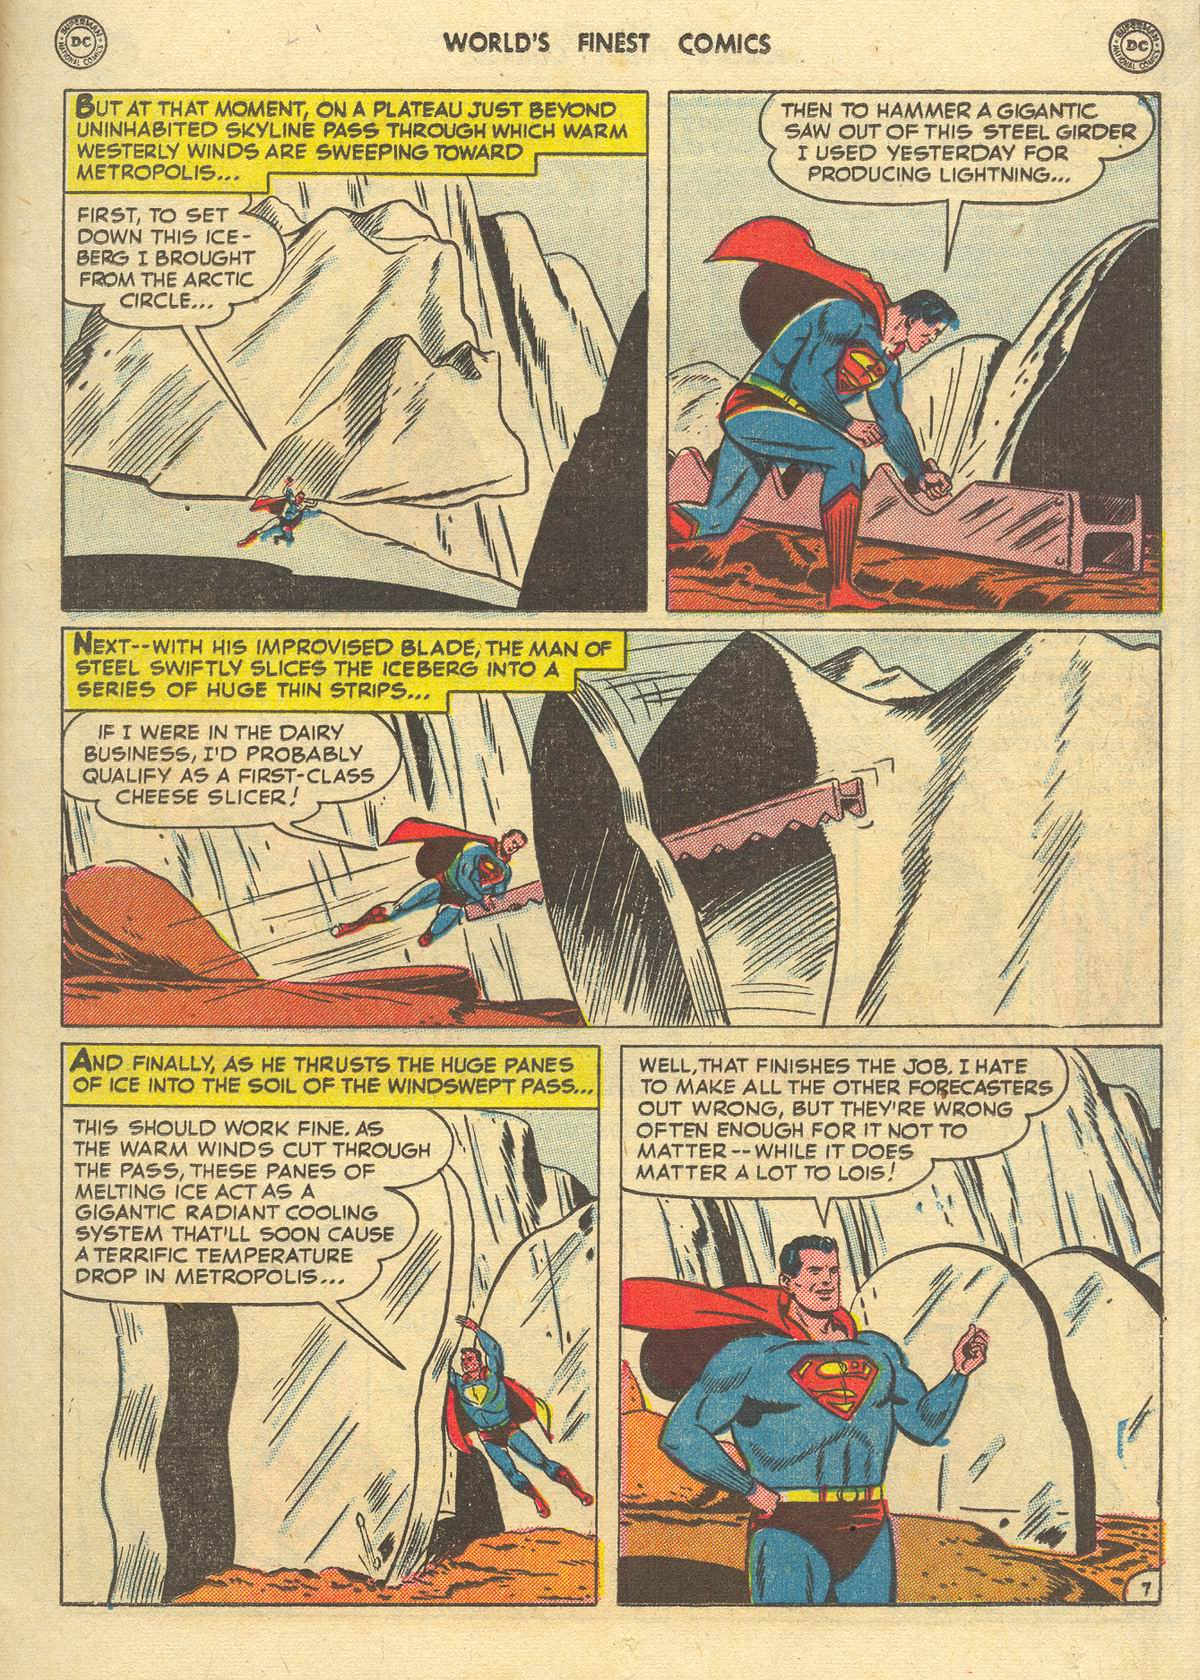 Read online World's Finest Comics comic -  Issue #51 - 9